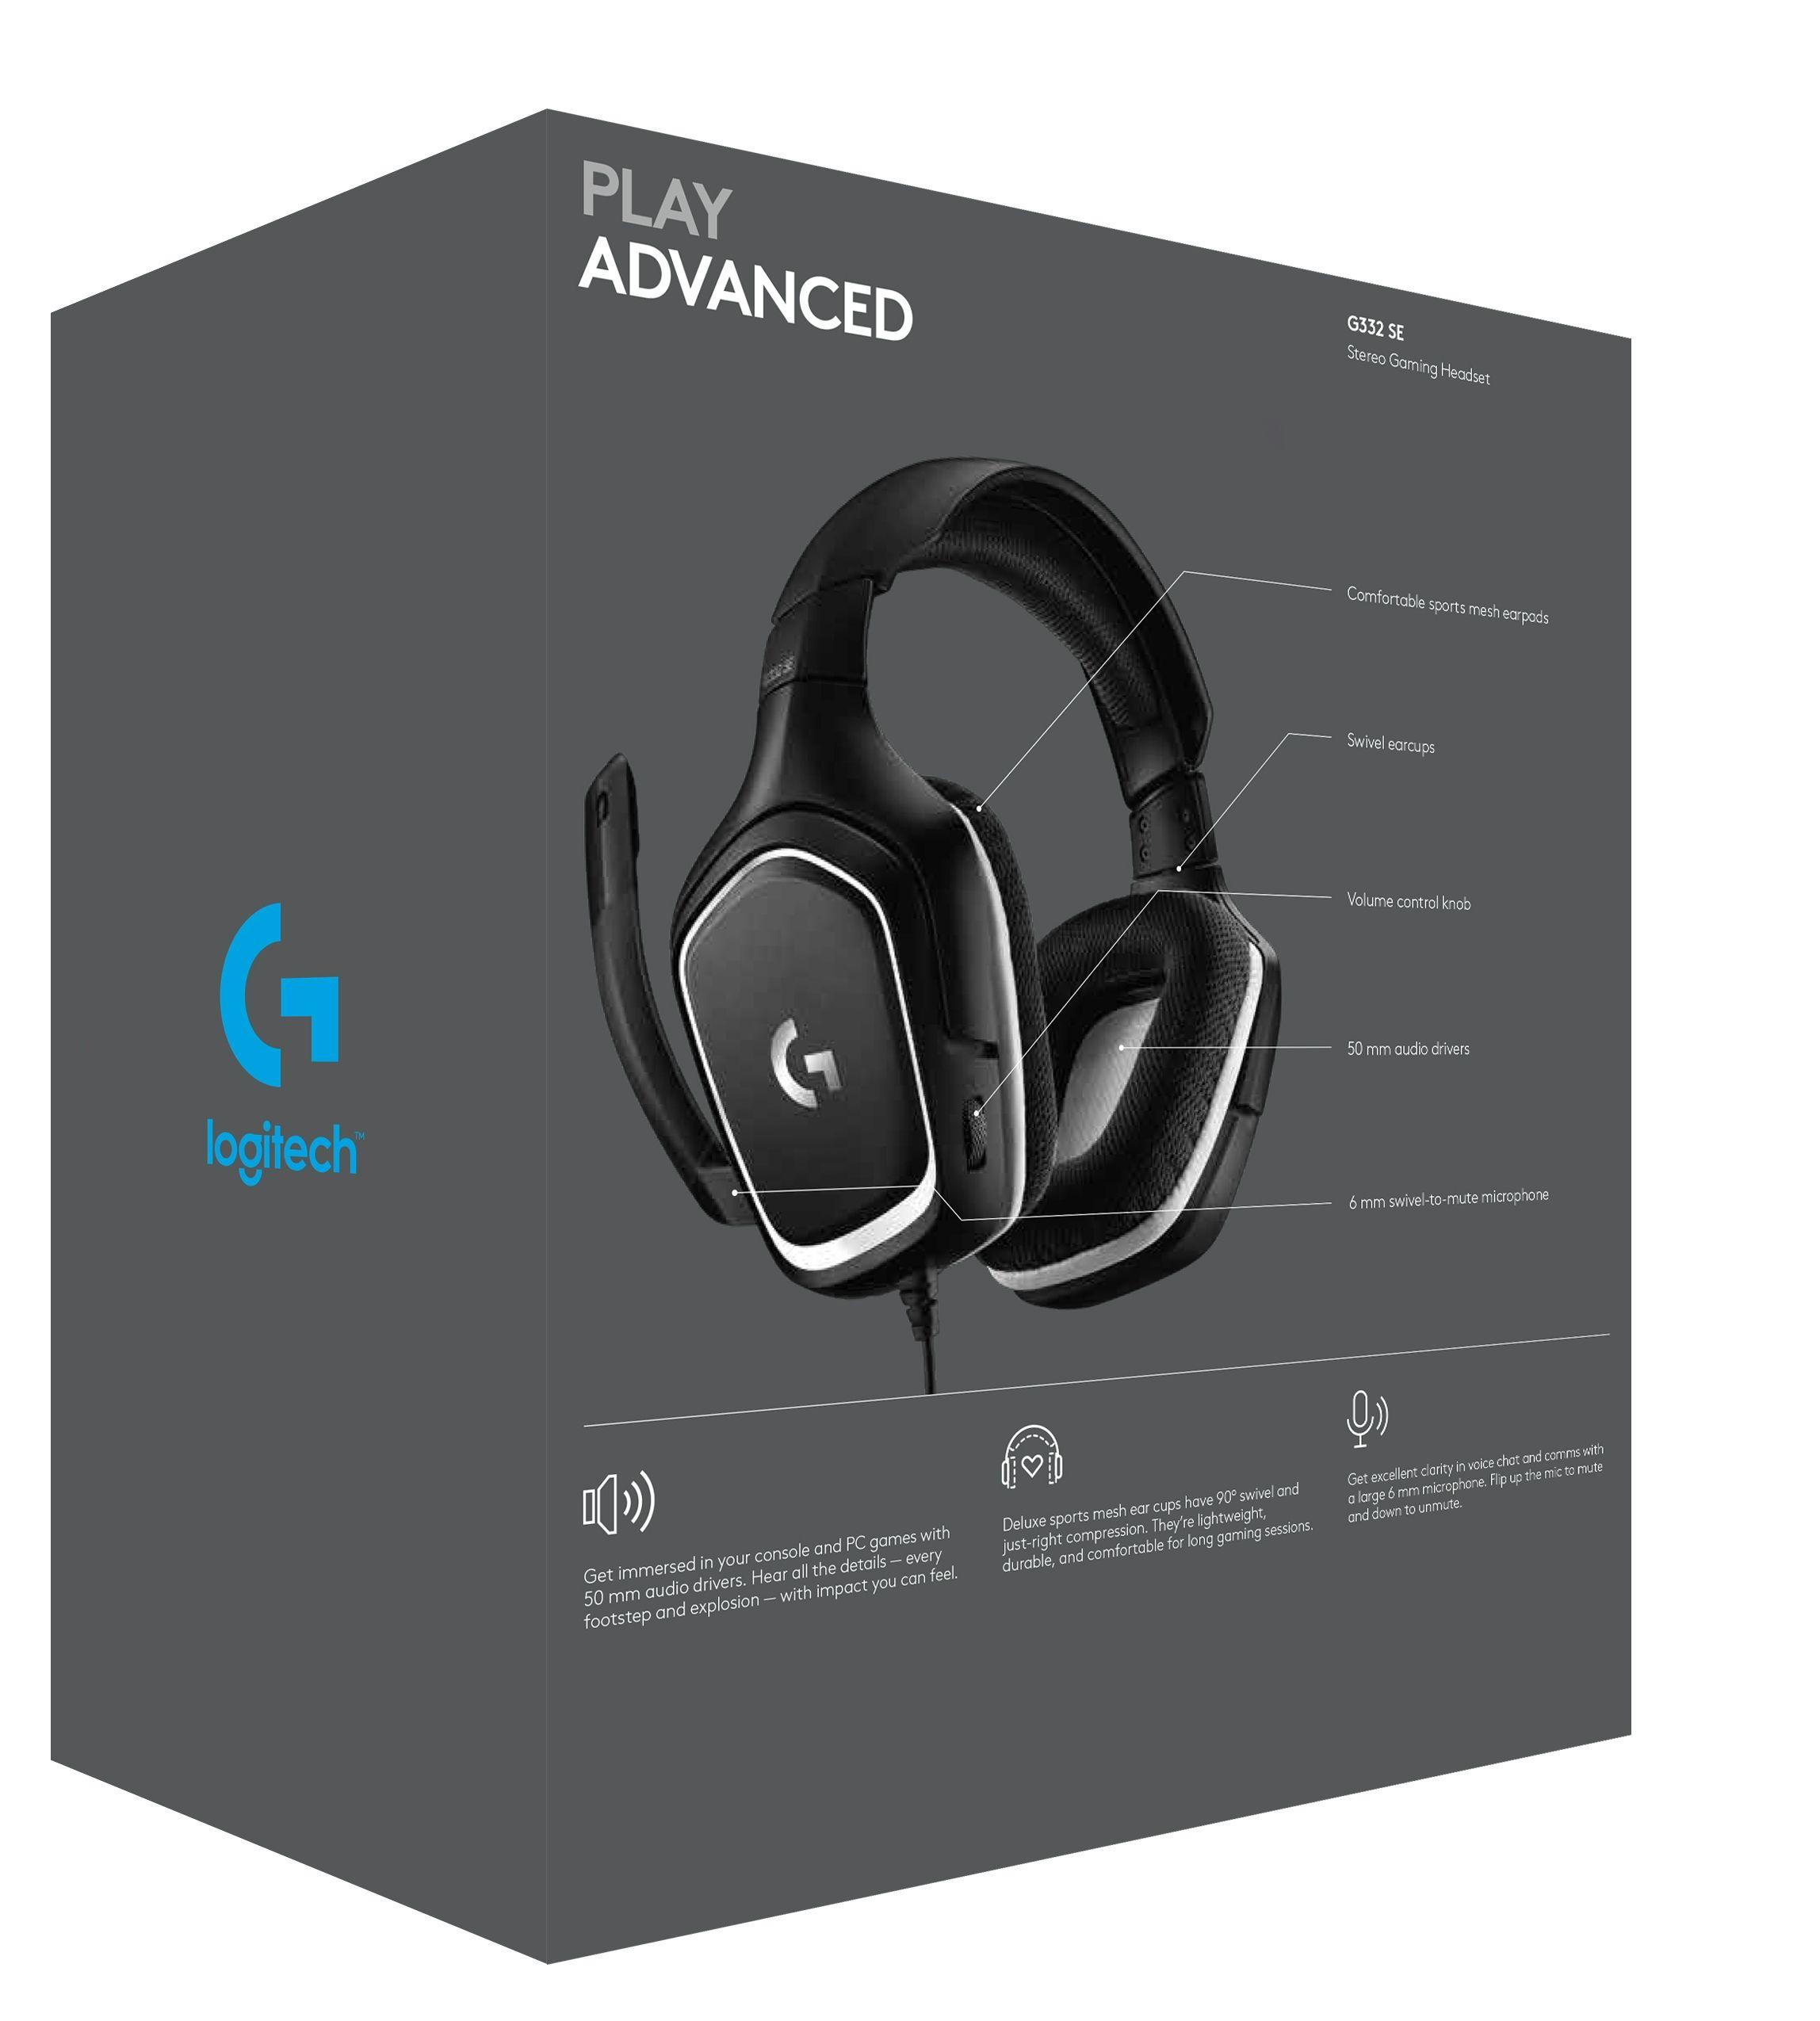 Гейминг слушалки Logitech - G332 Special Edition, черни - 4